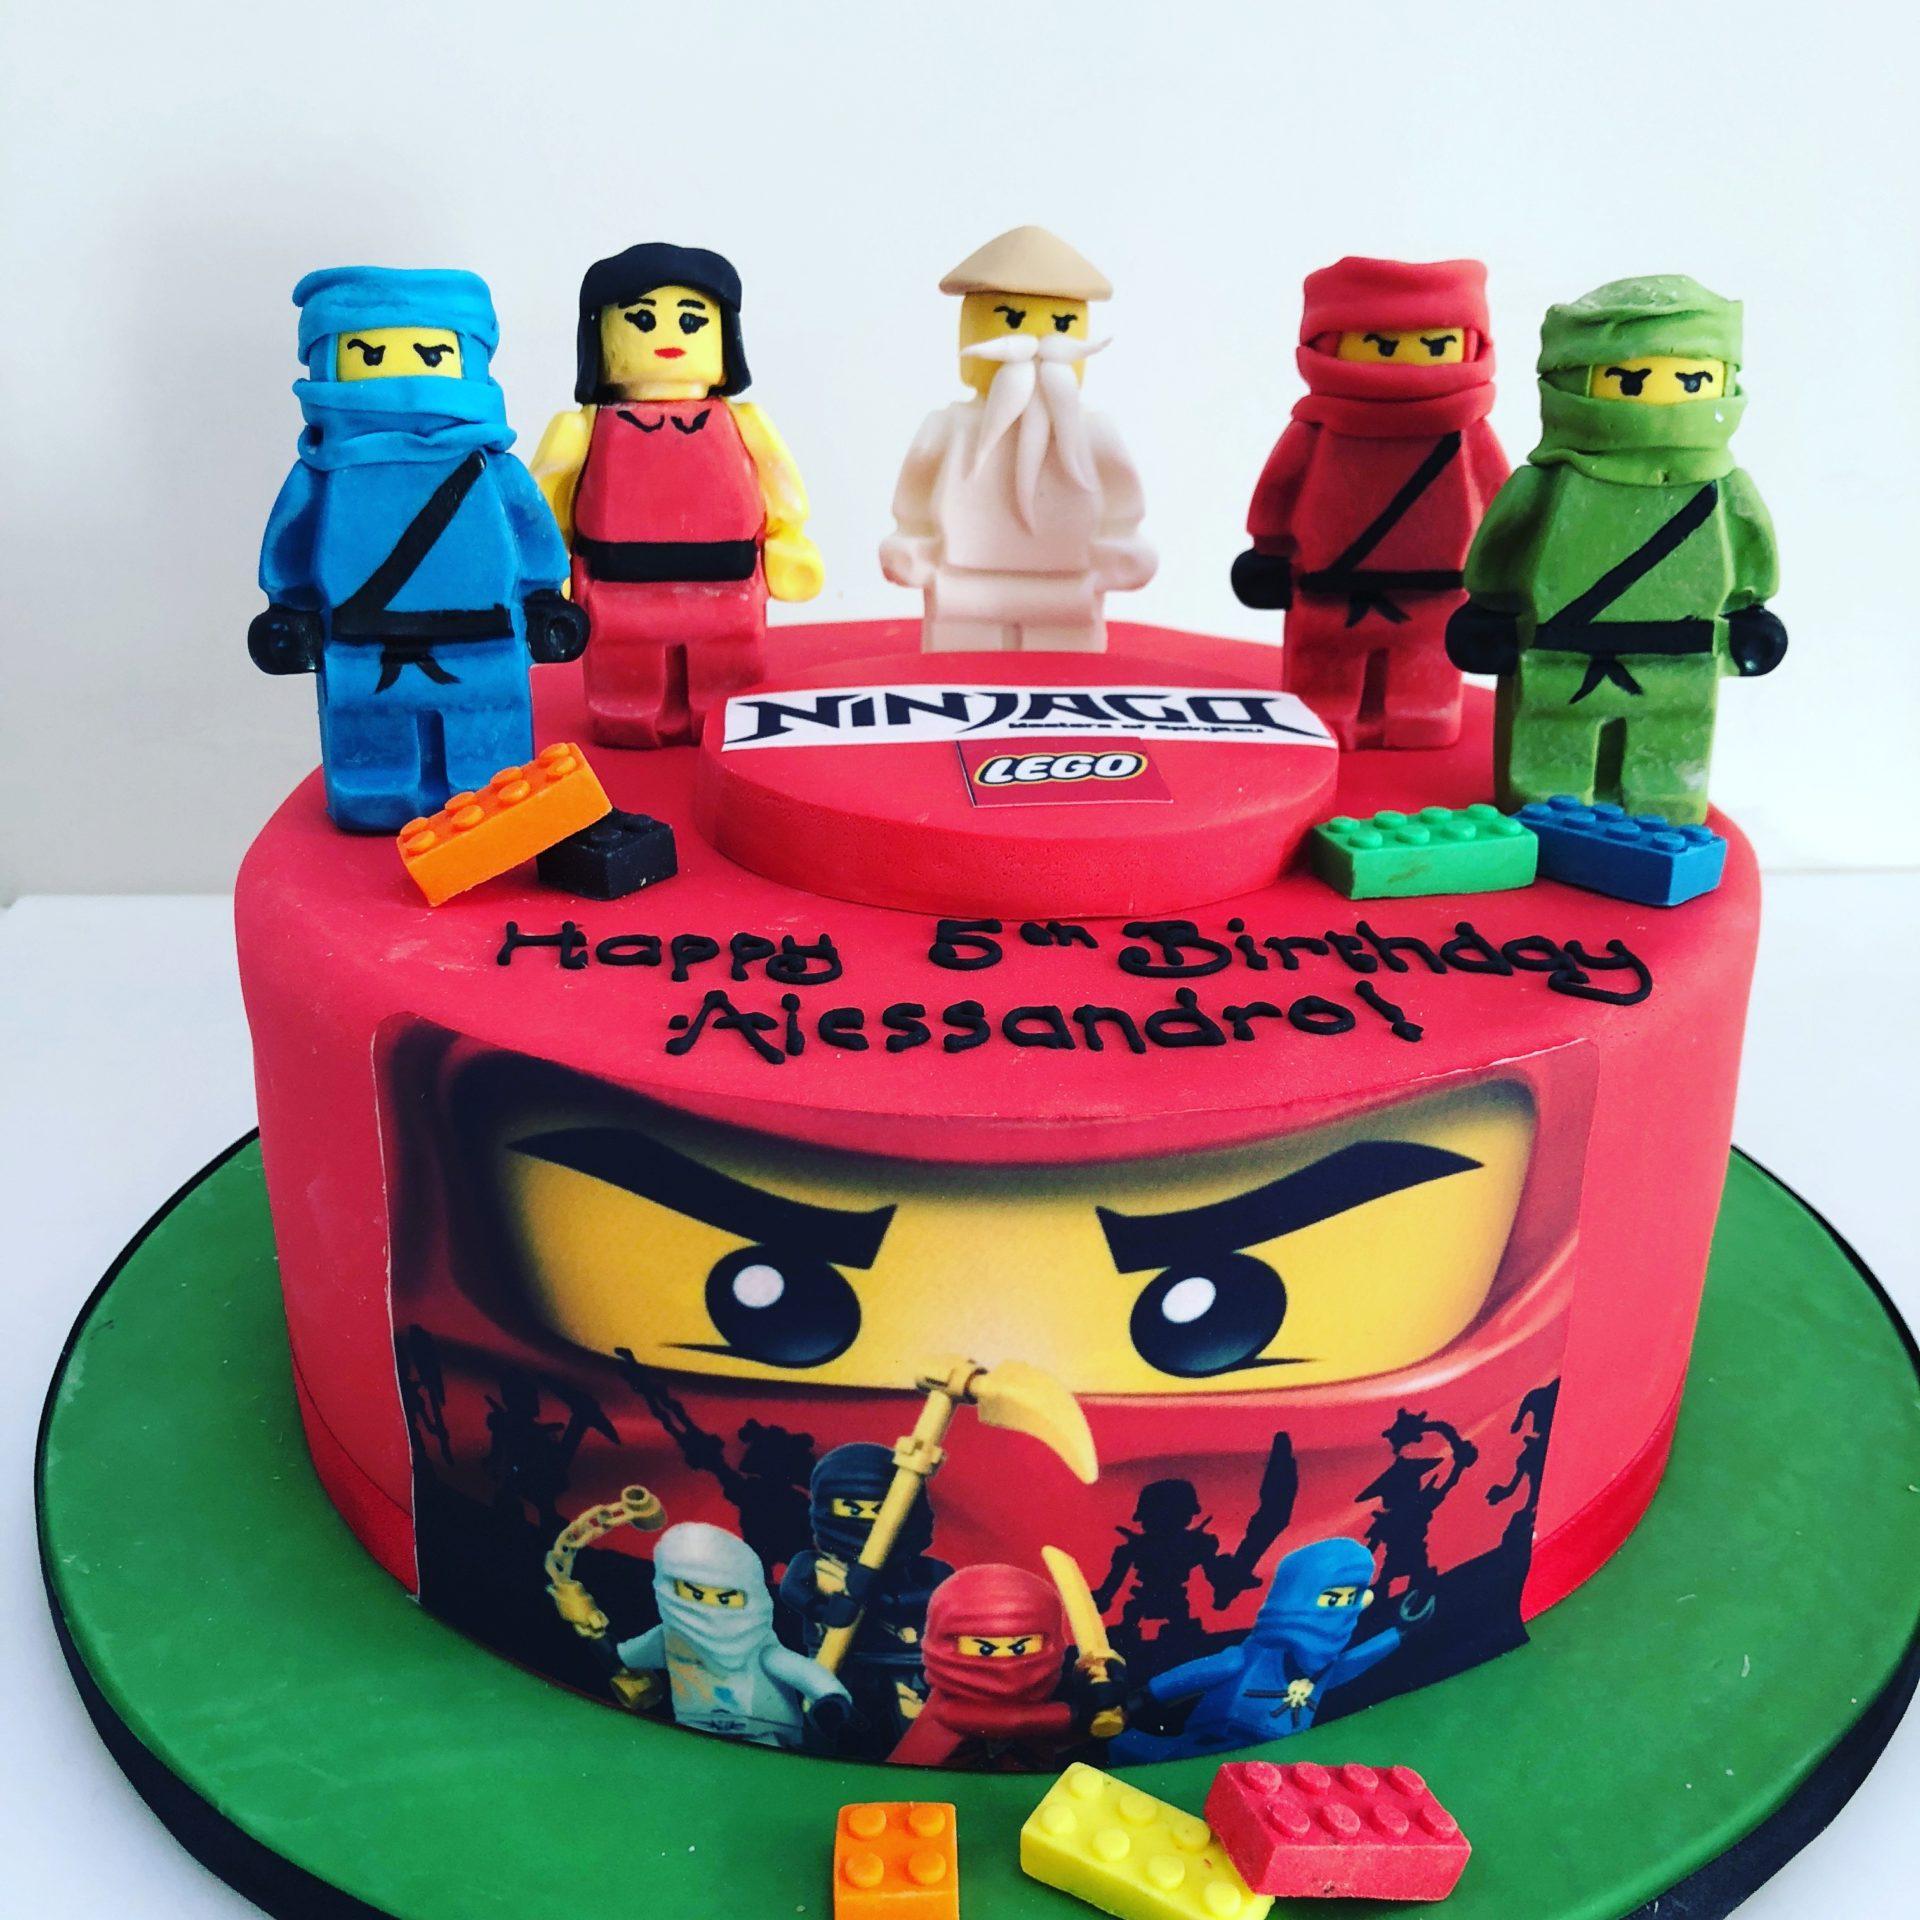 LEGO Ninjago Cake - Etoile Bakery